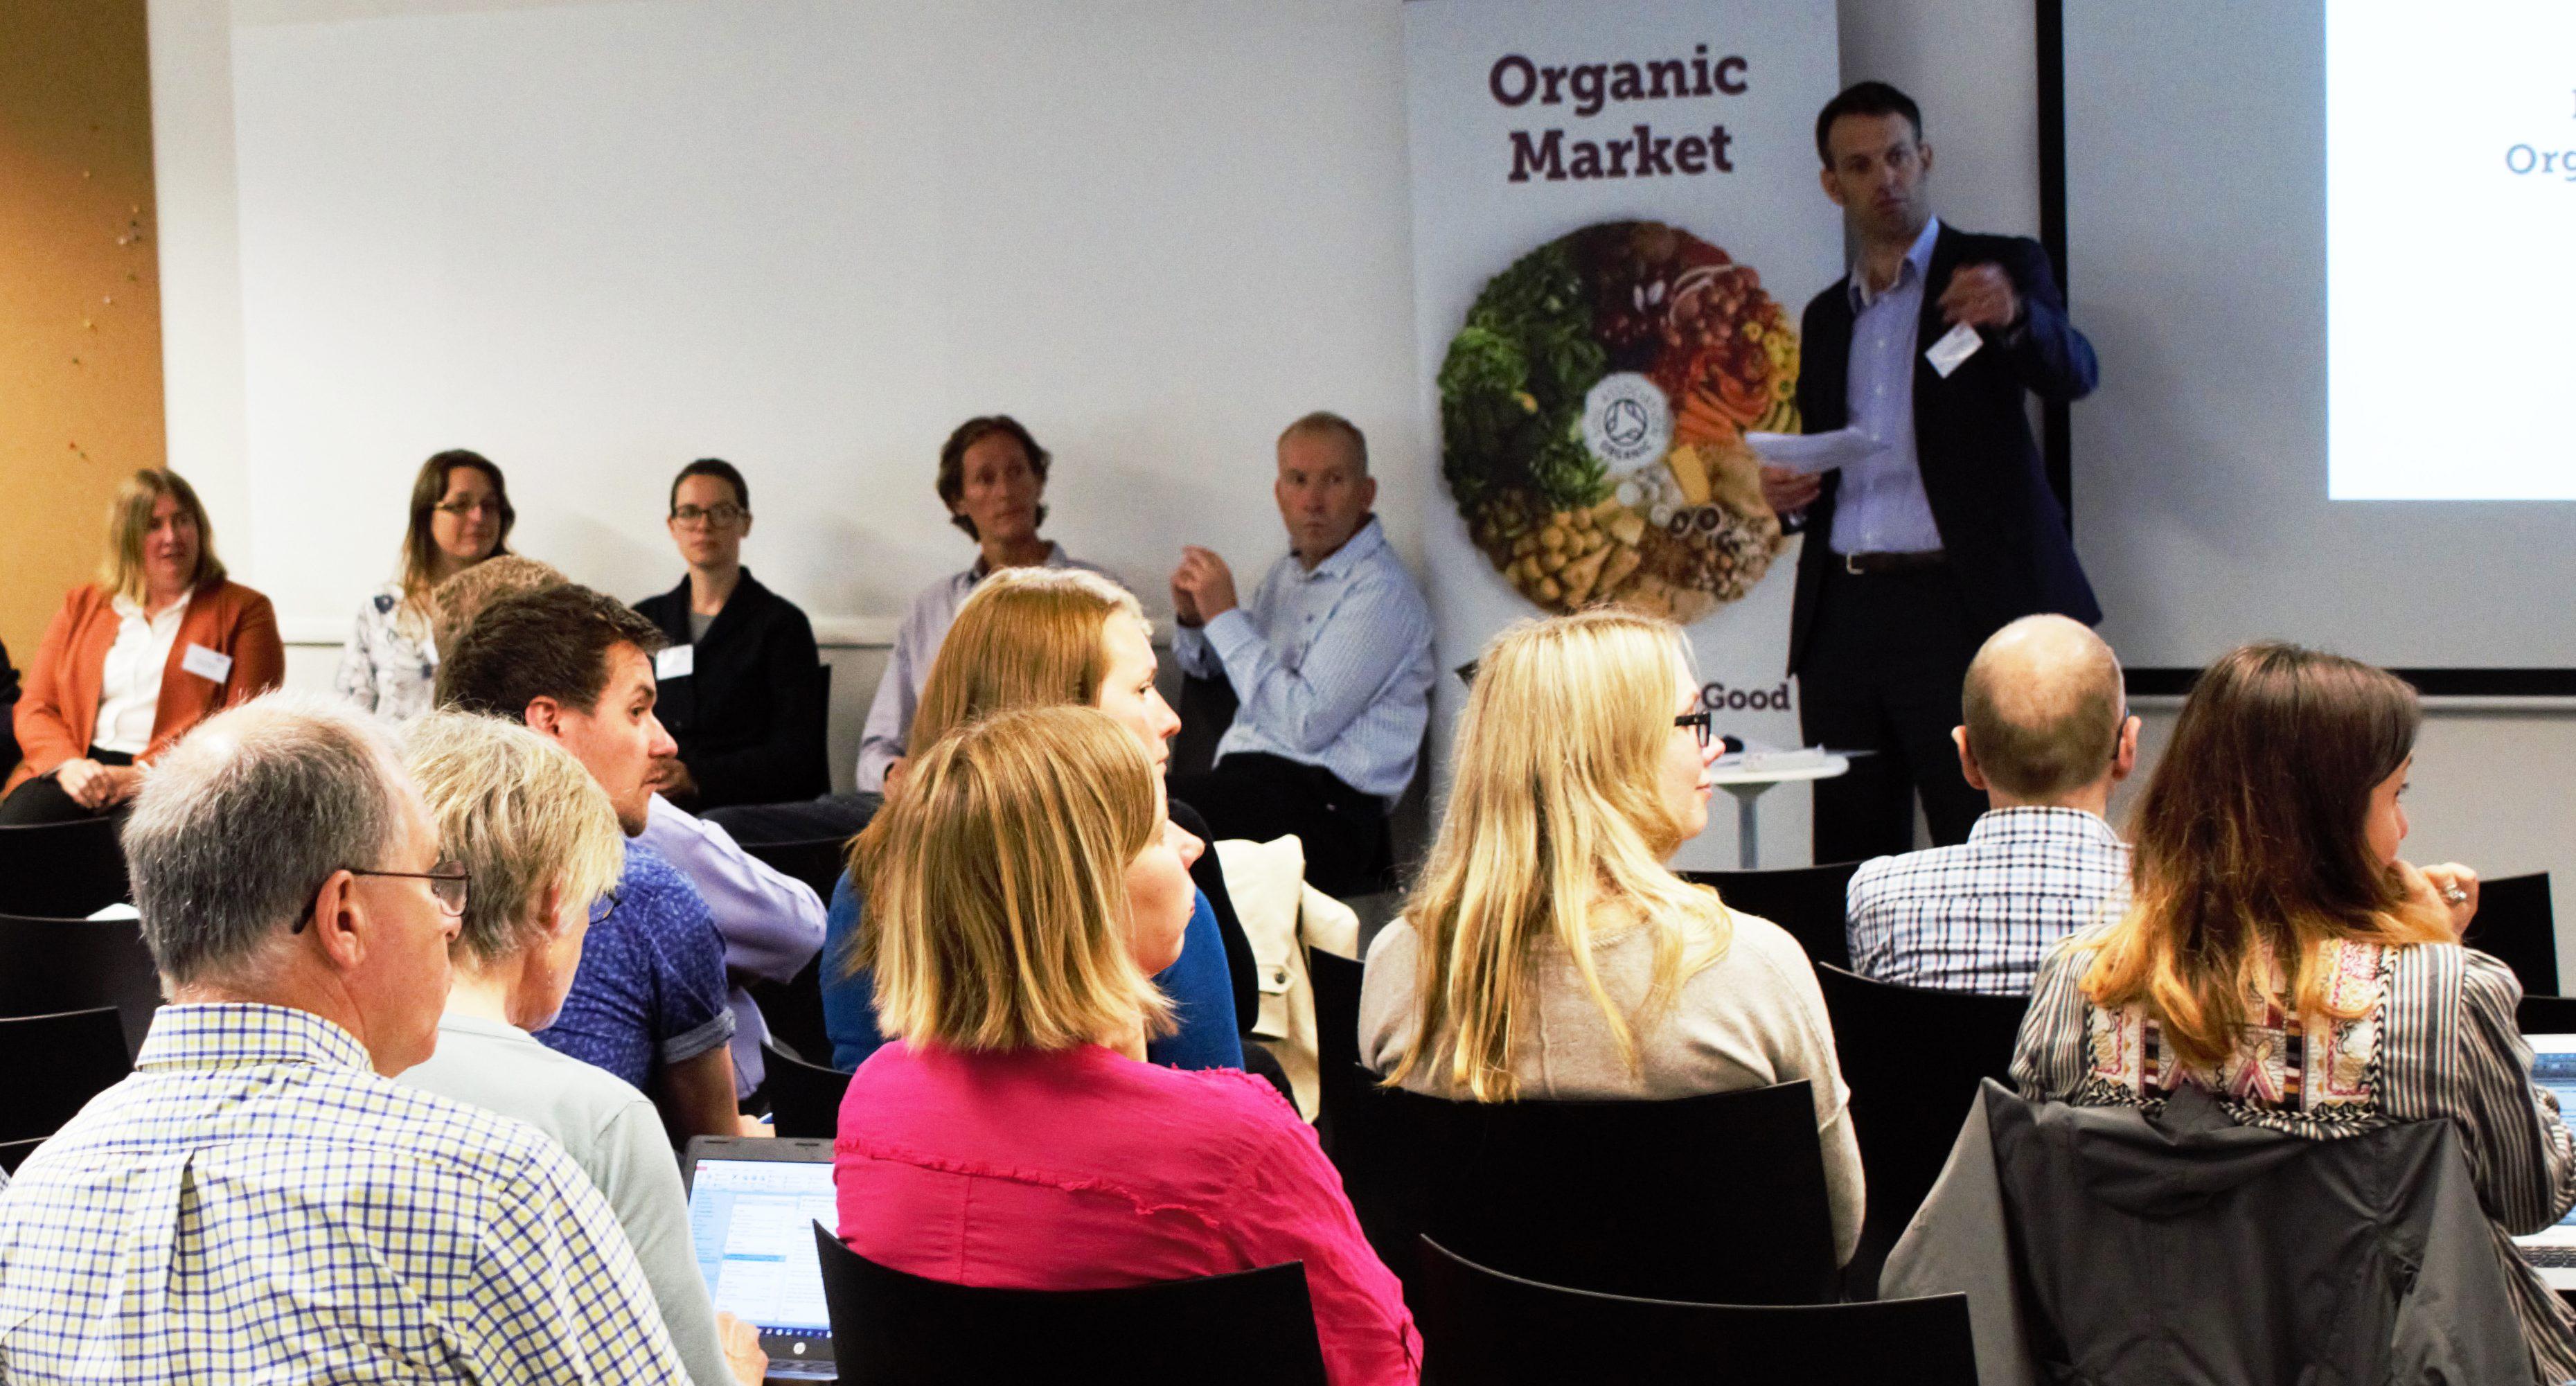 Organic supply chains